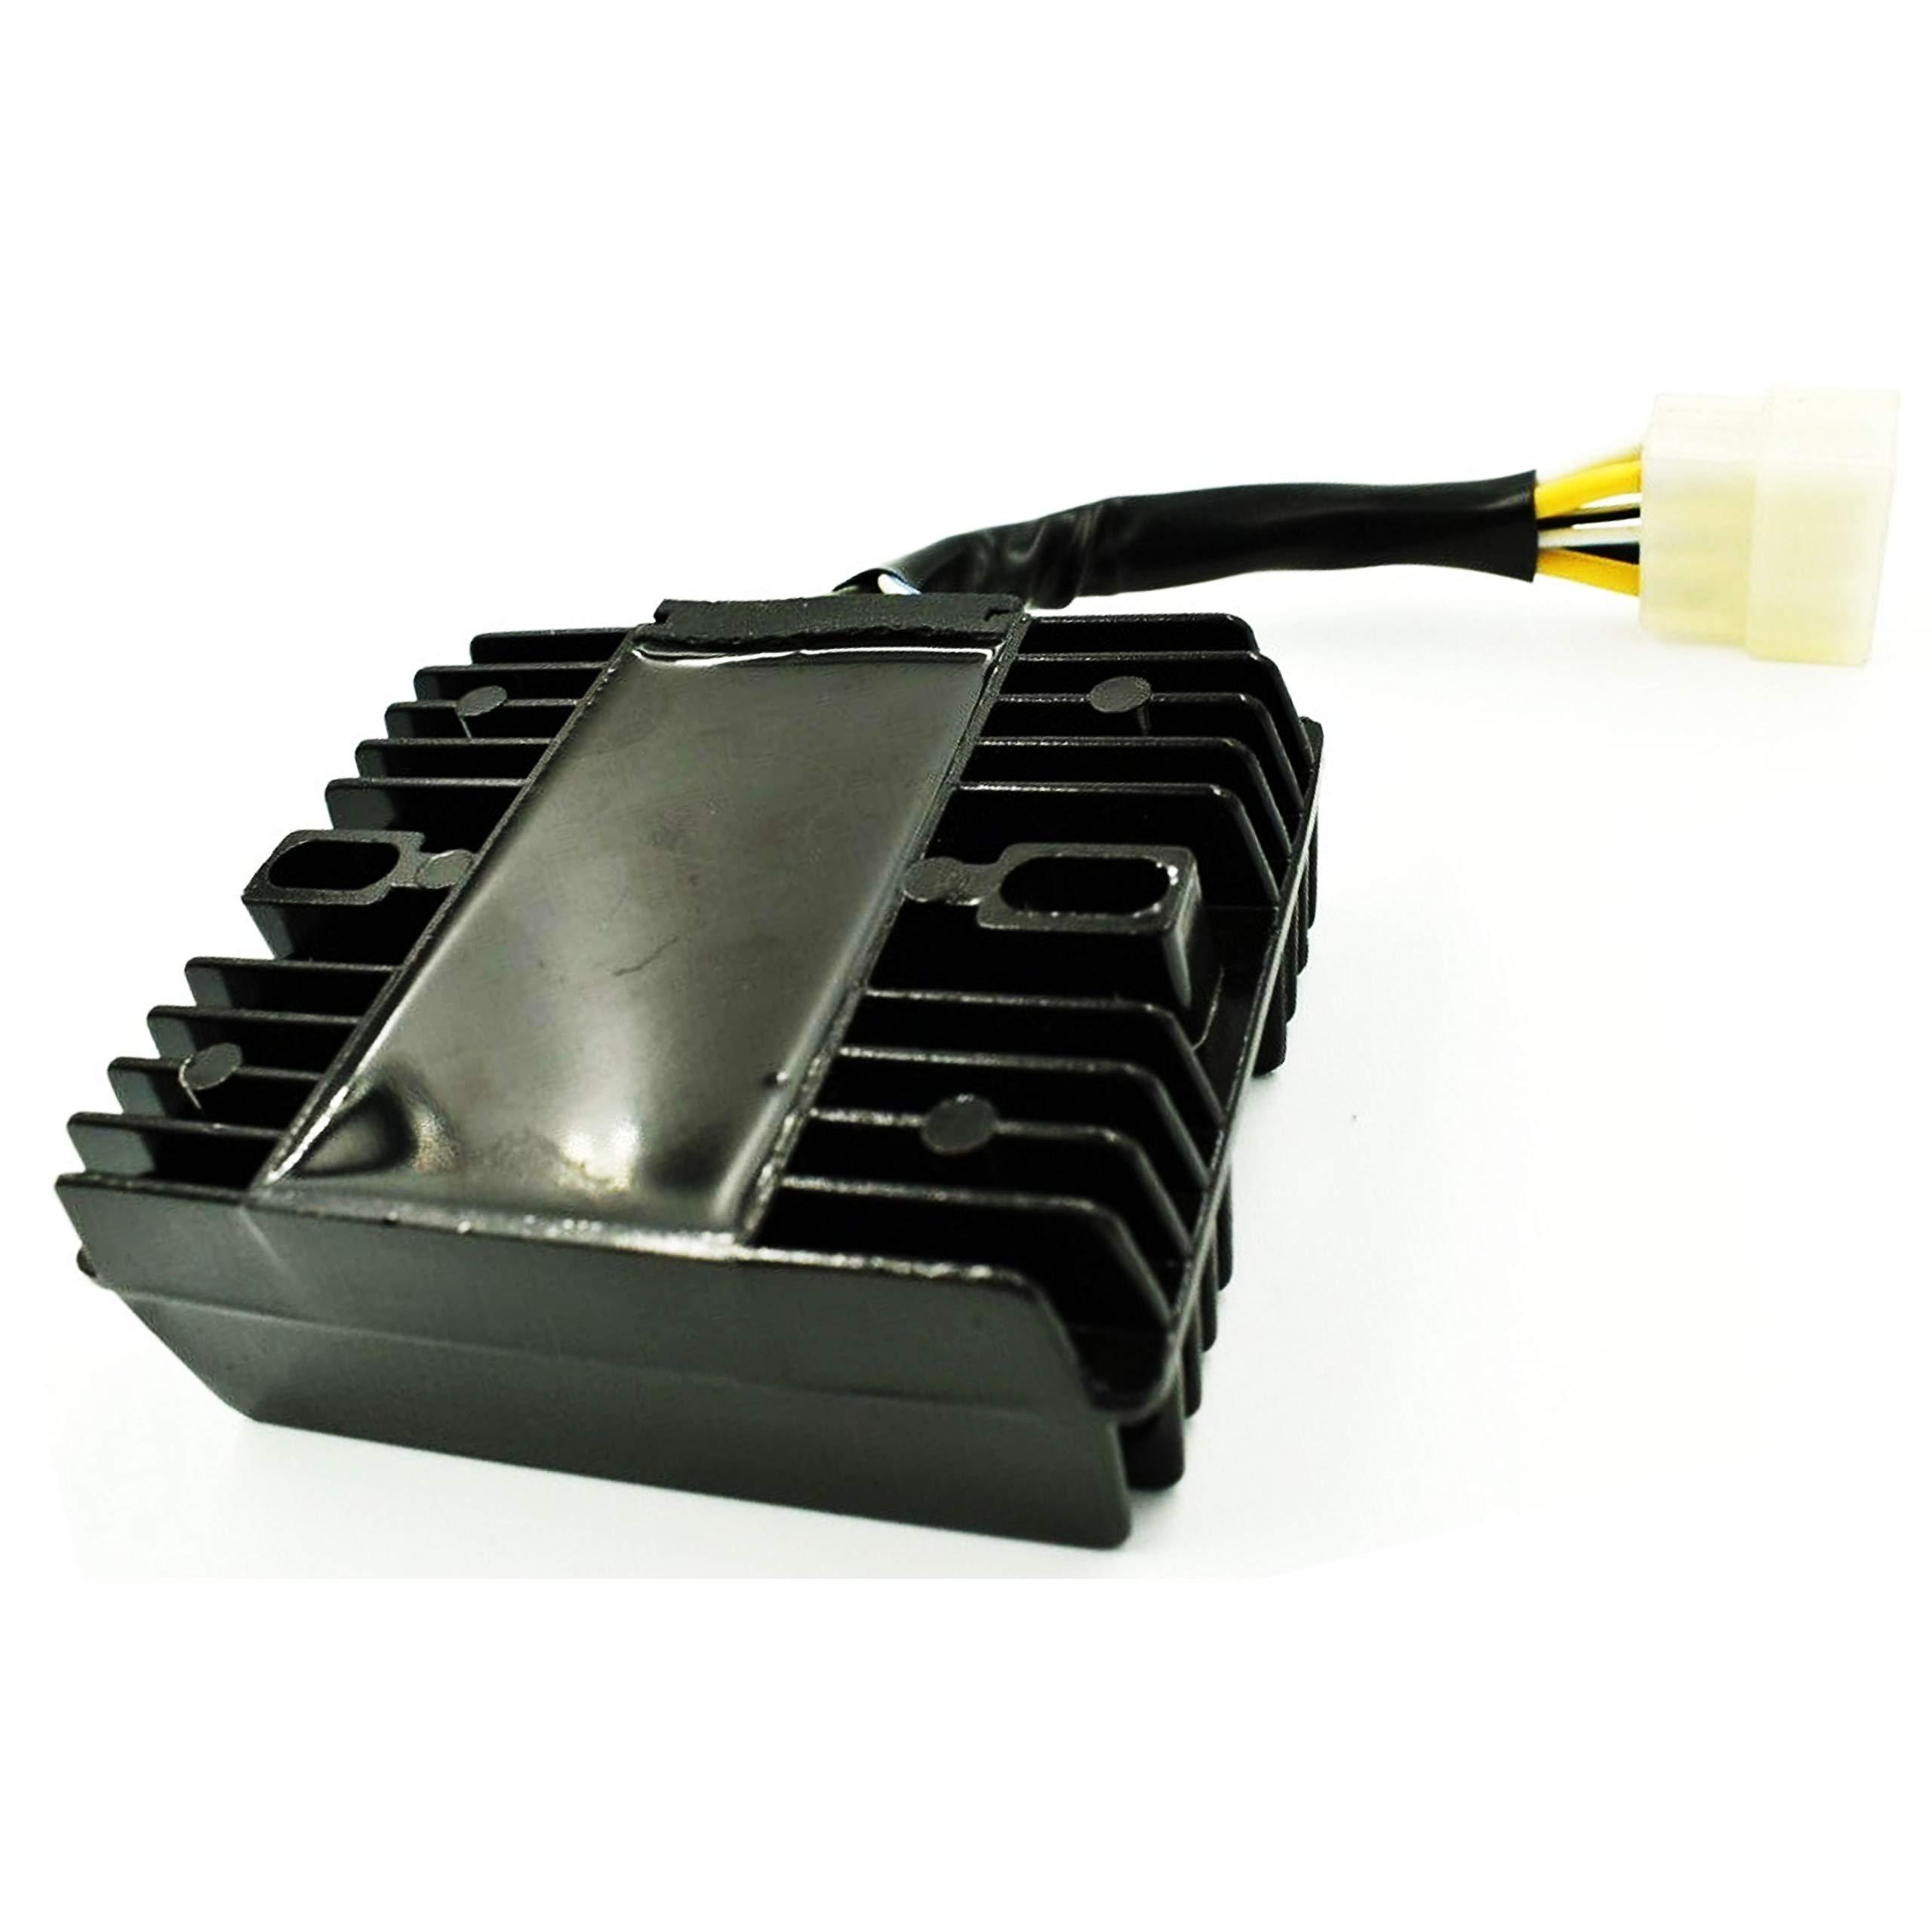 GX340 GCV530 GX620 GXV670 31620-ZG5-023 GX670 GXV520 GX270 GXV620 GXV530 GX610 GXV610 GX640 31620-ZG5-013 20A Voltage Regulator Rectifier 31620-ZG5-033 for Honda GCV520 GX390 GX240